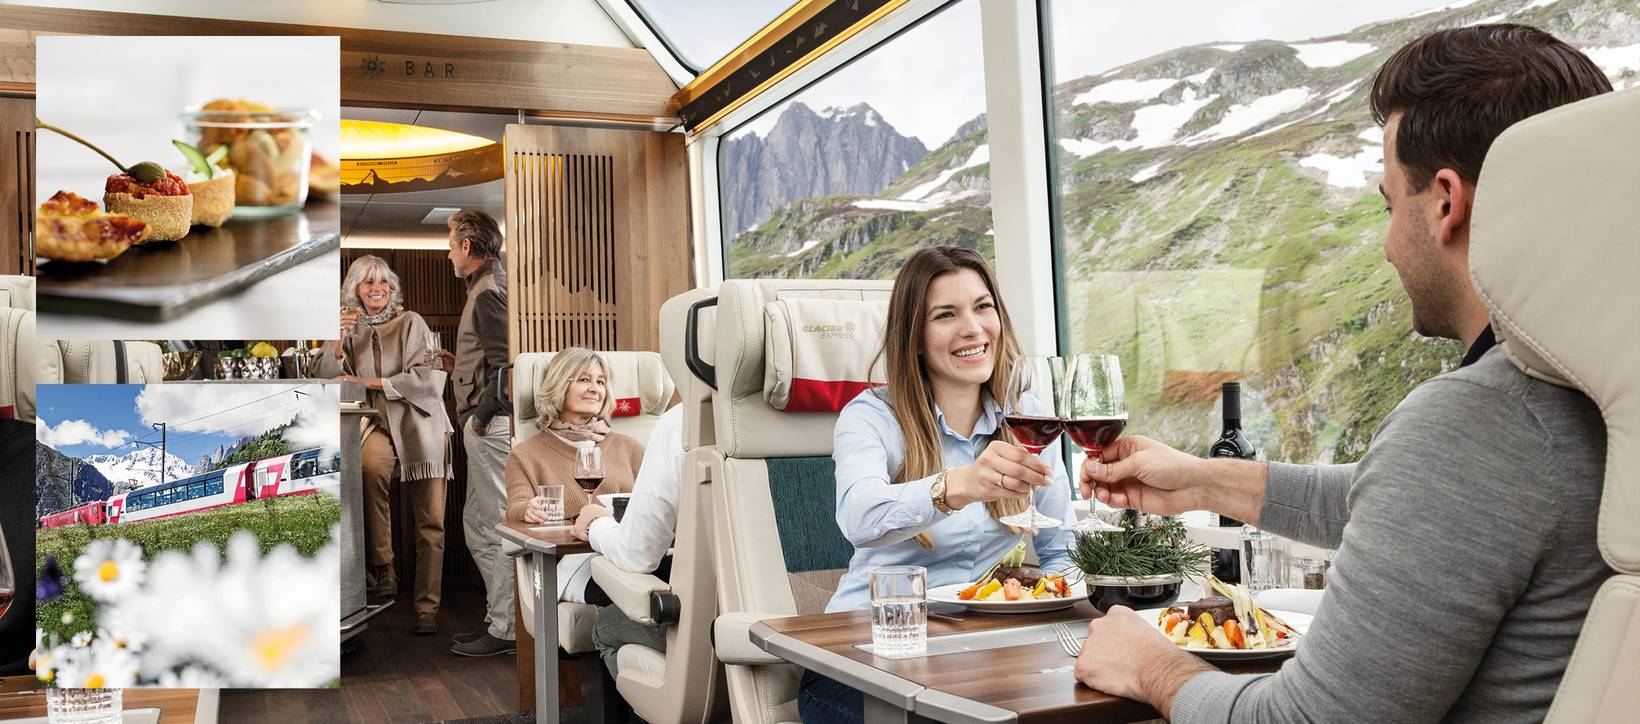 Excellence Class   luxuriös entdecken mit dem Glacier Express